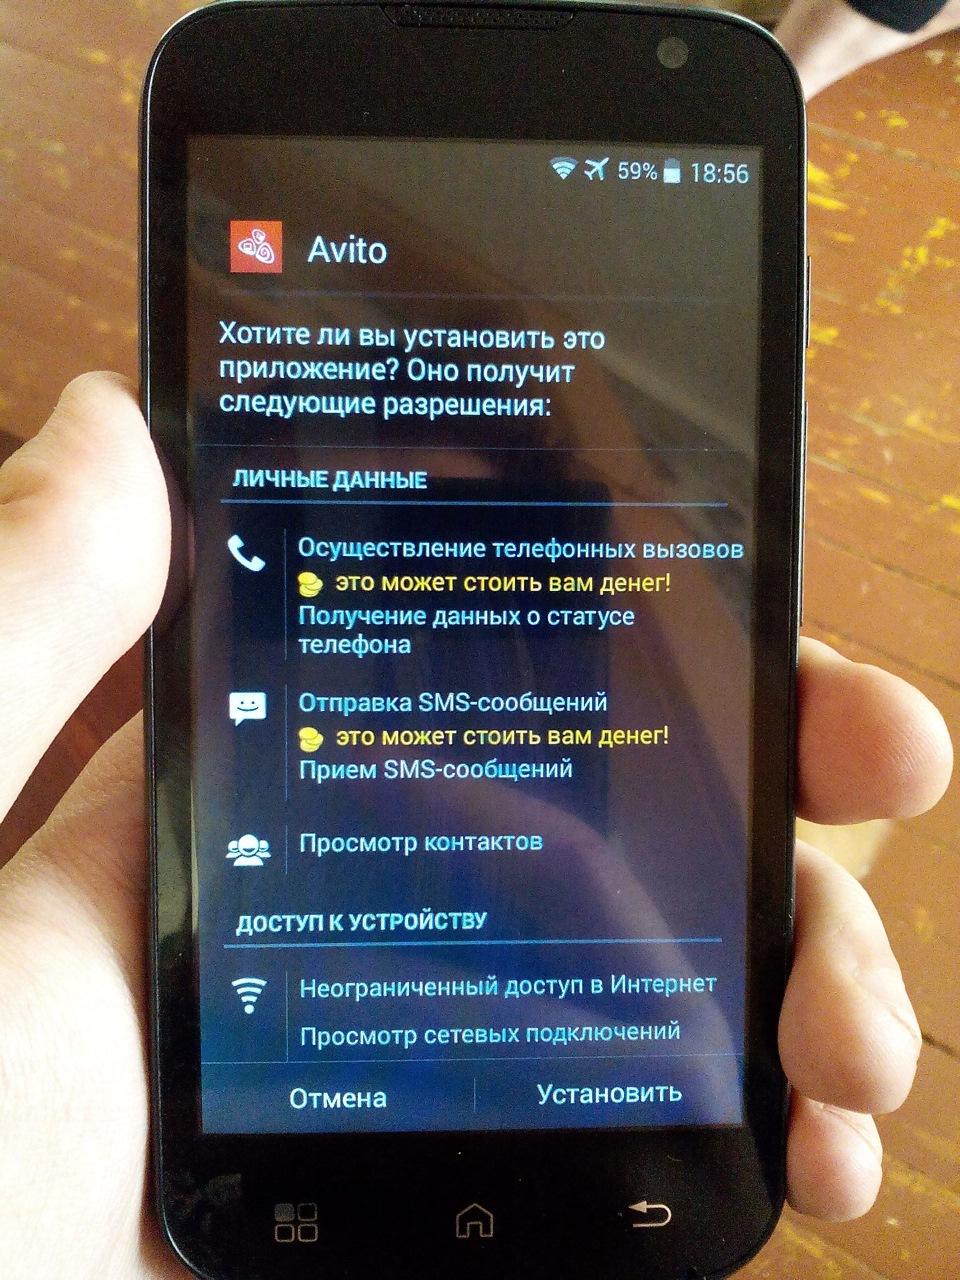 SMS мошенники quotОплата услуг на сумму 7380 RUR произведена